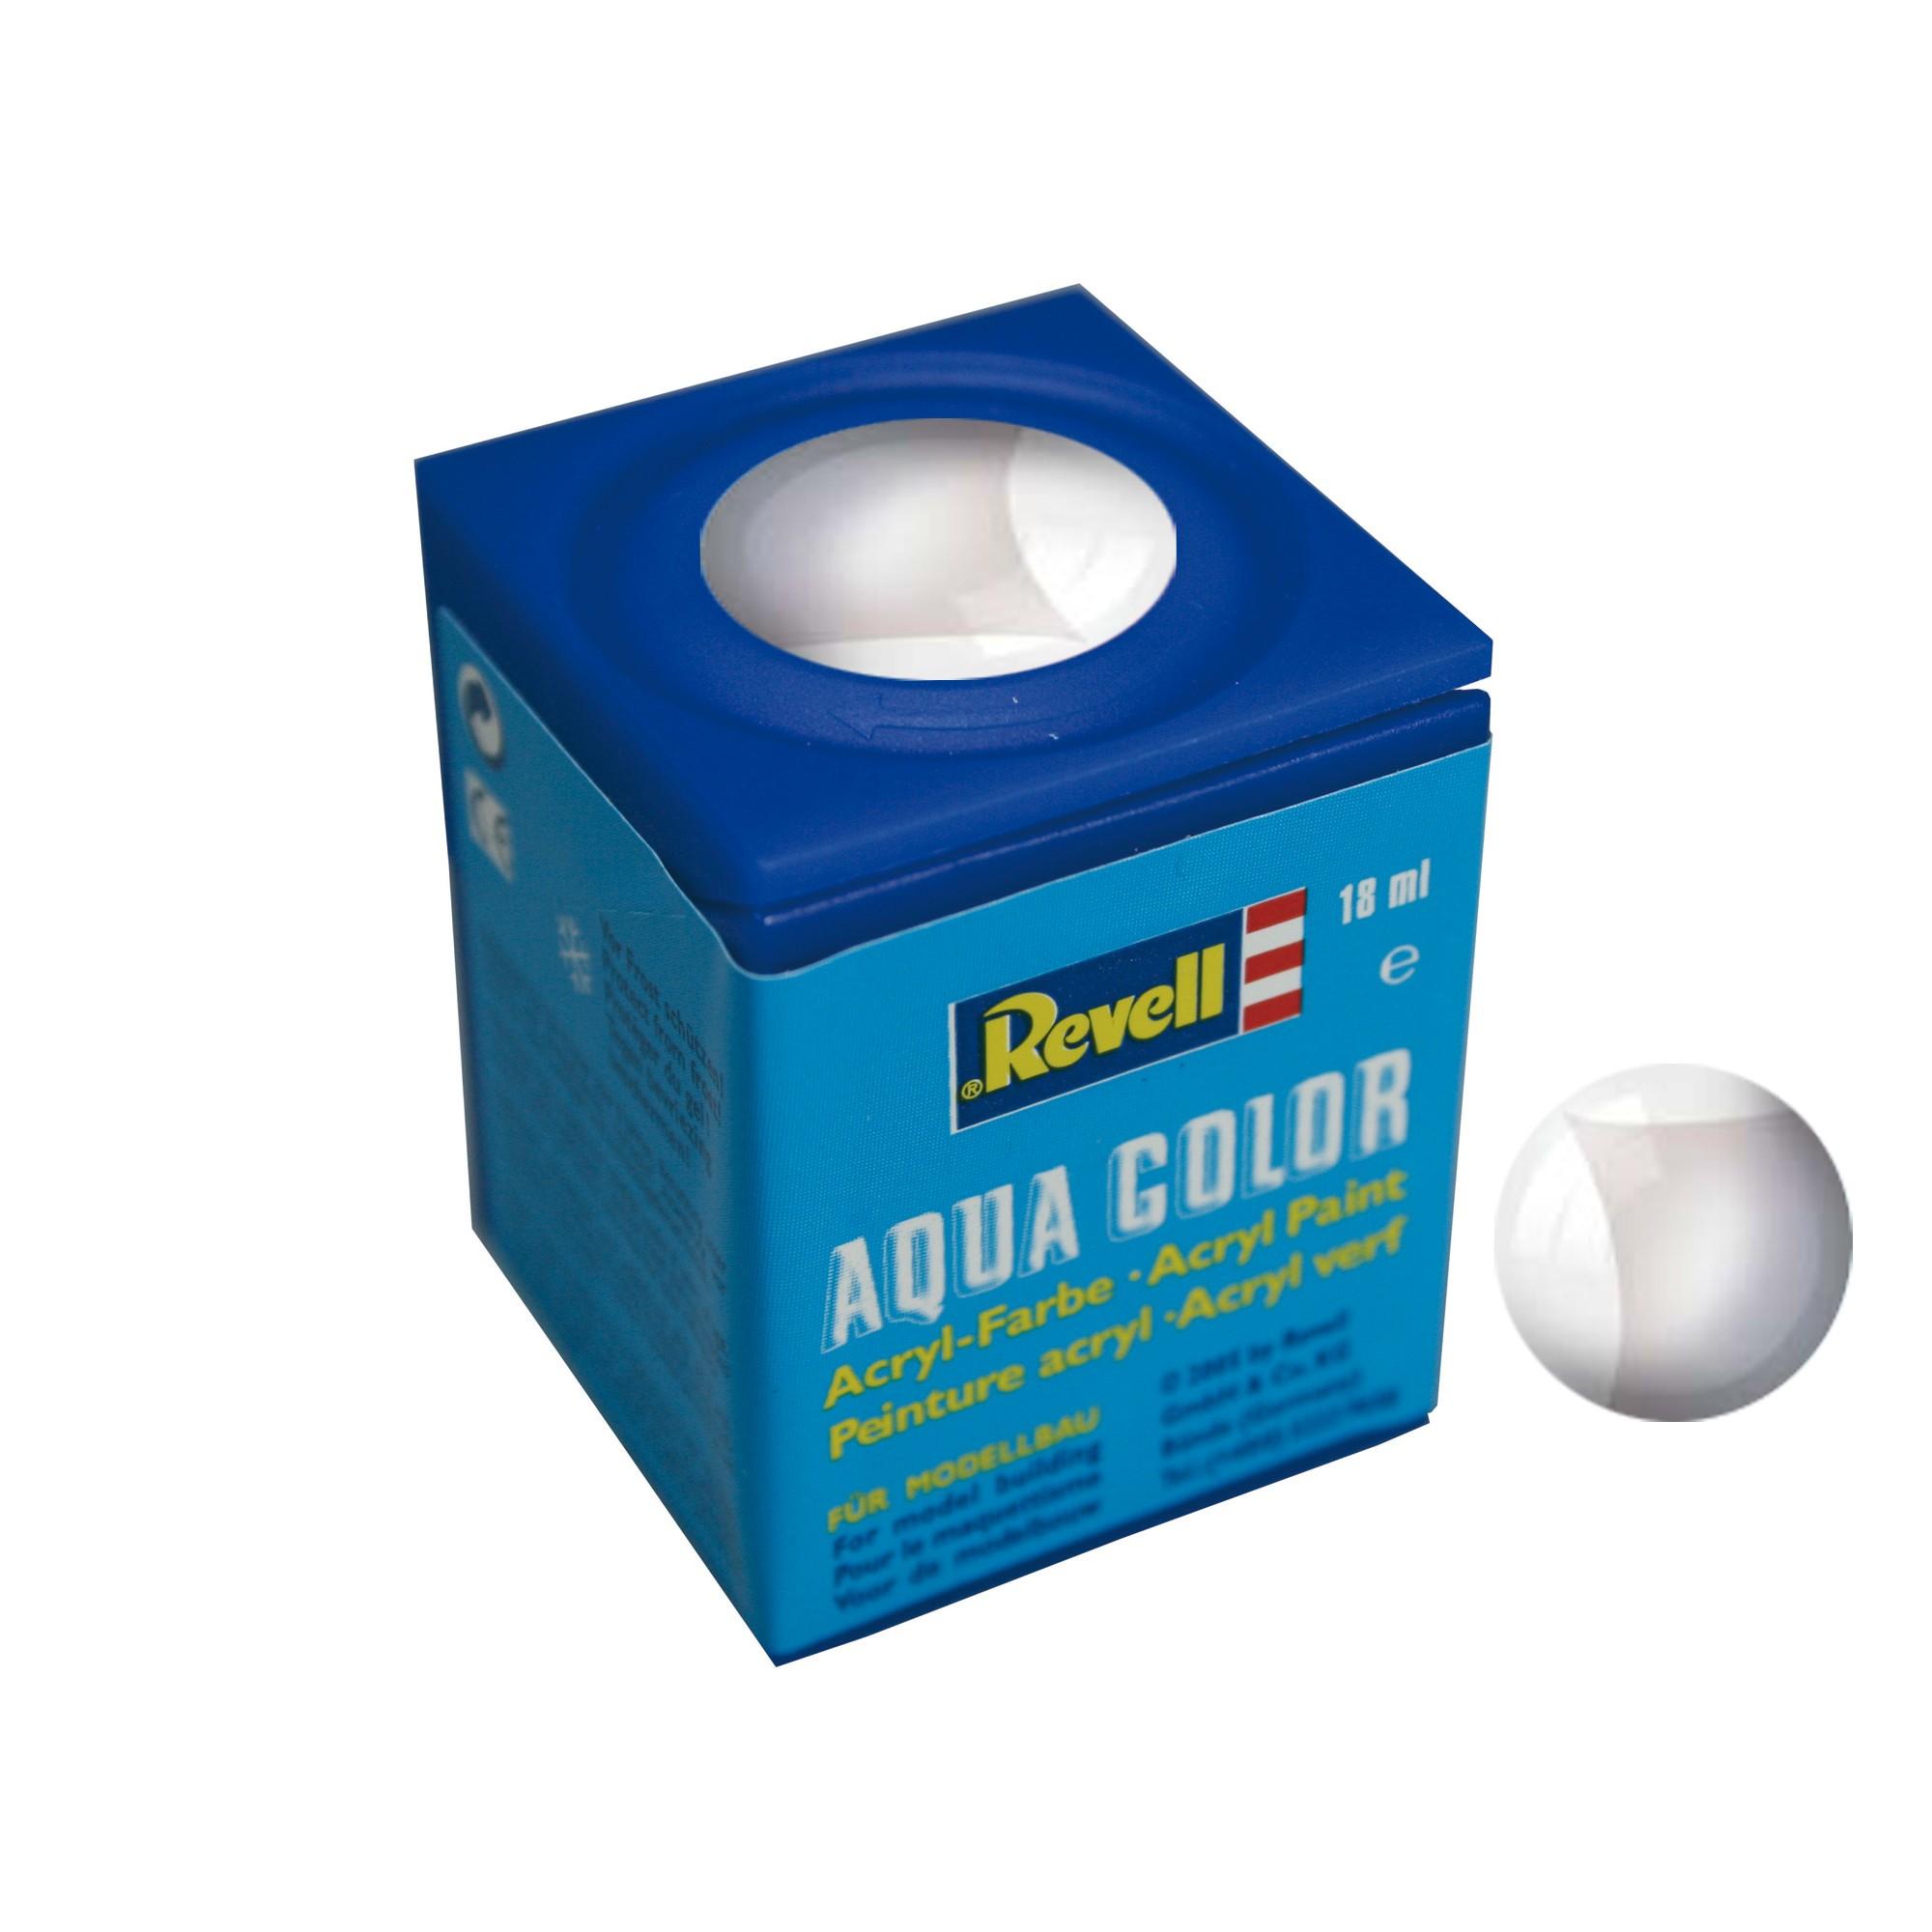 Revell Aqua Color glänzend farblos